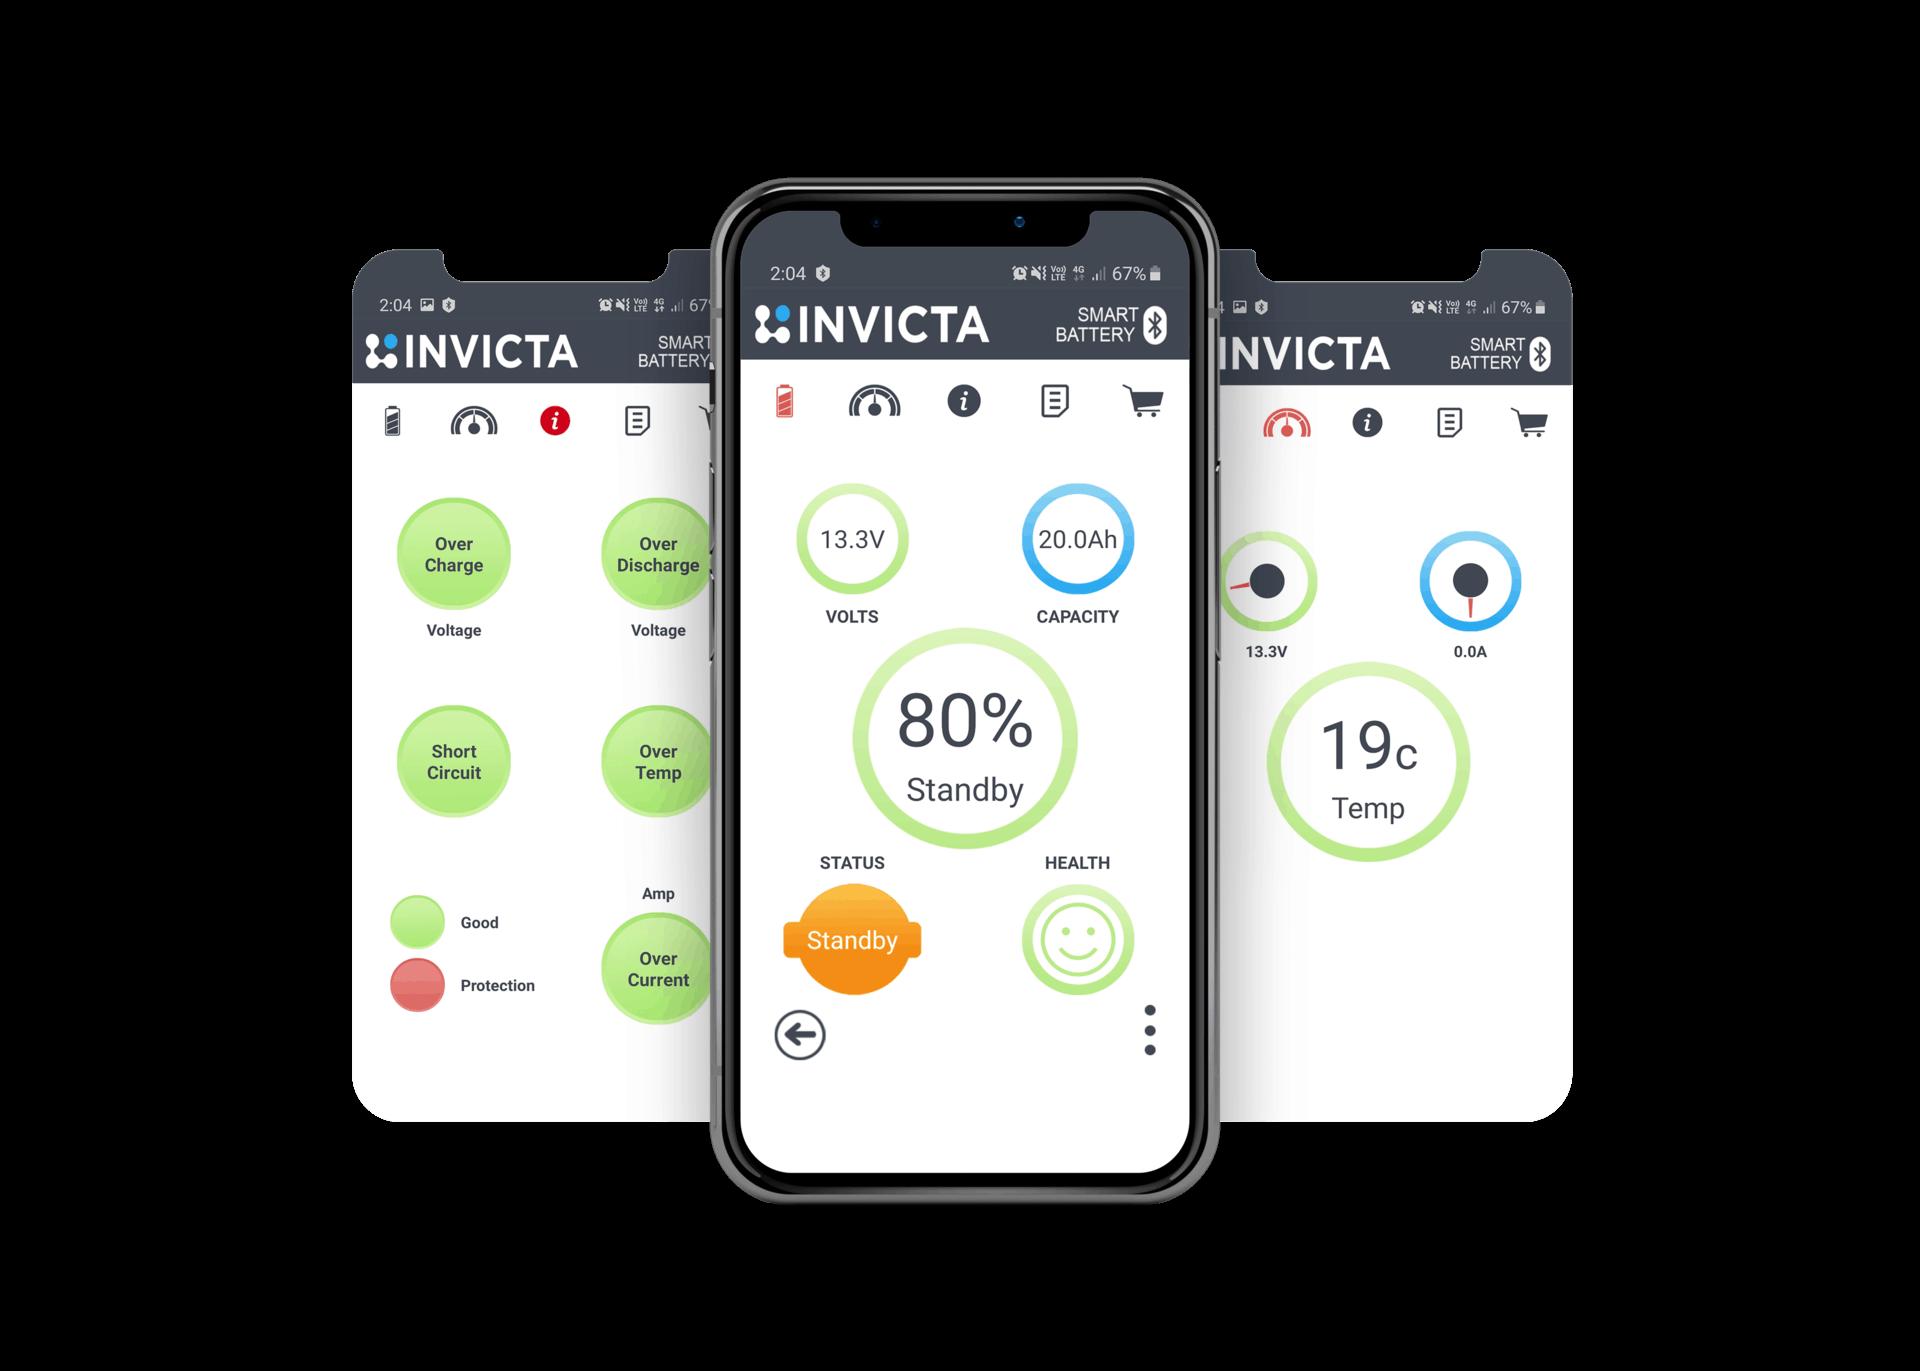 INVICTA Battery Bluetooth Screen